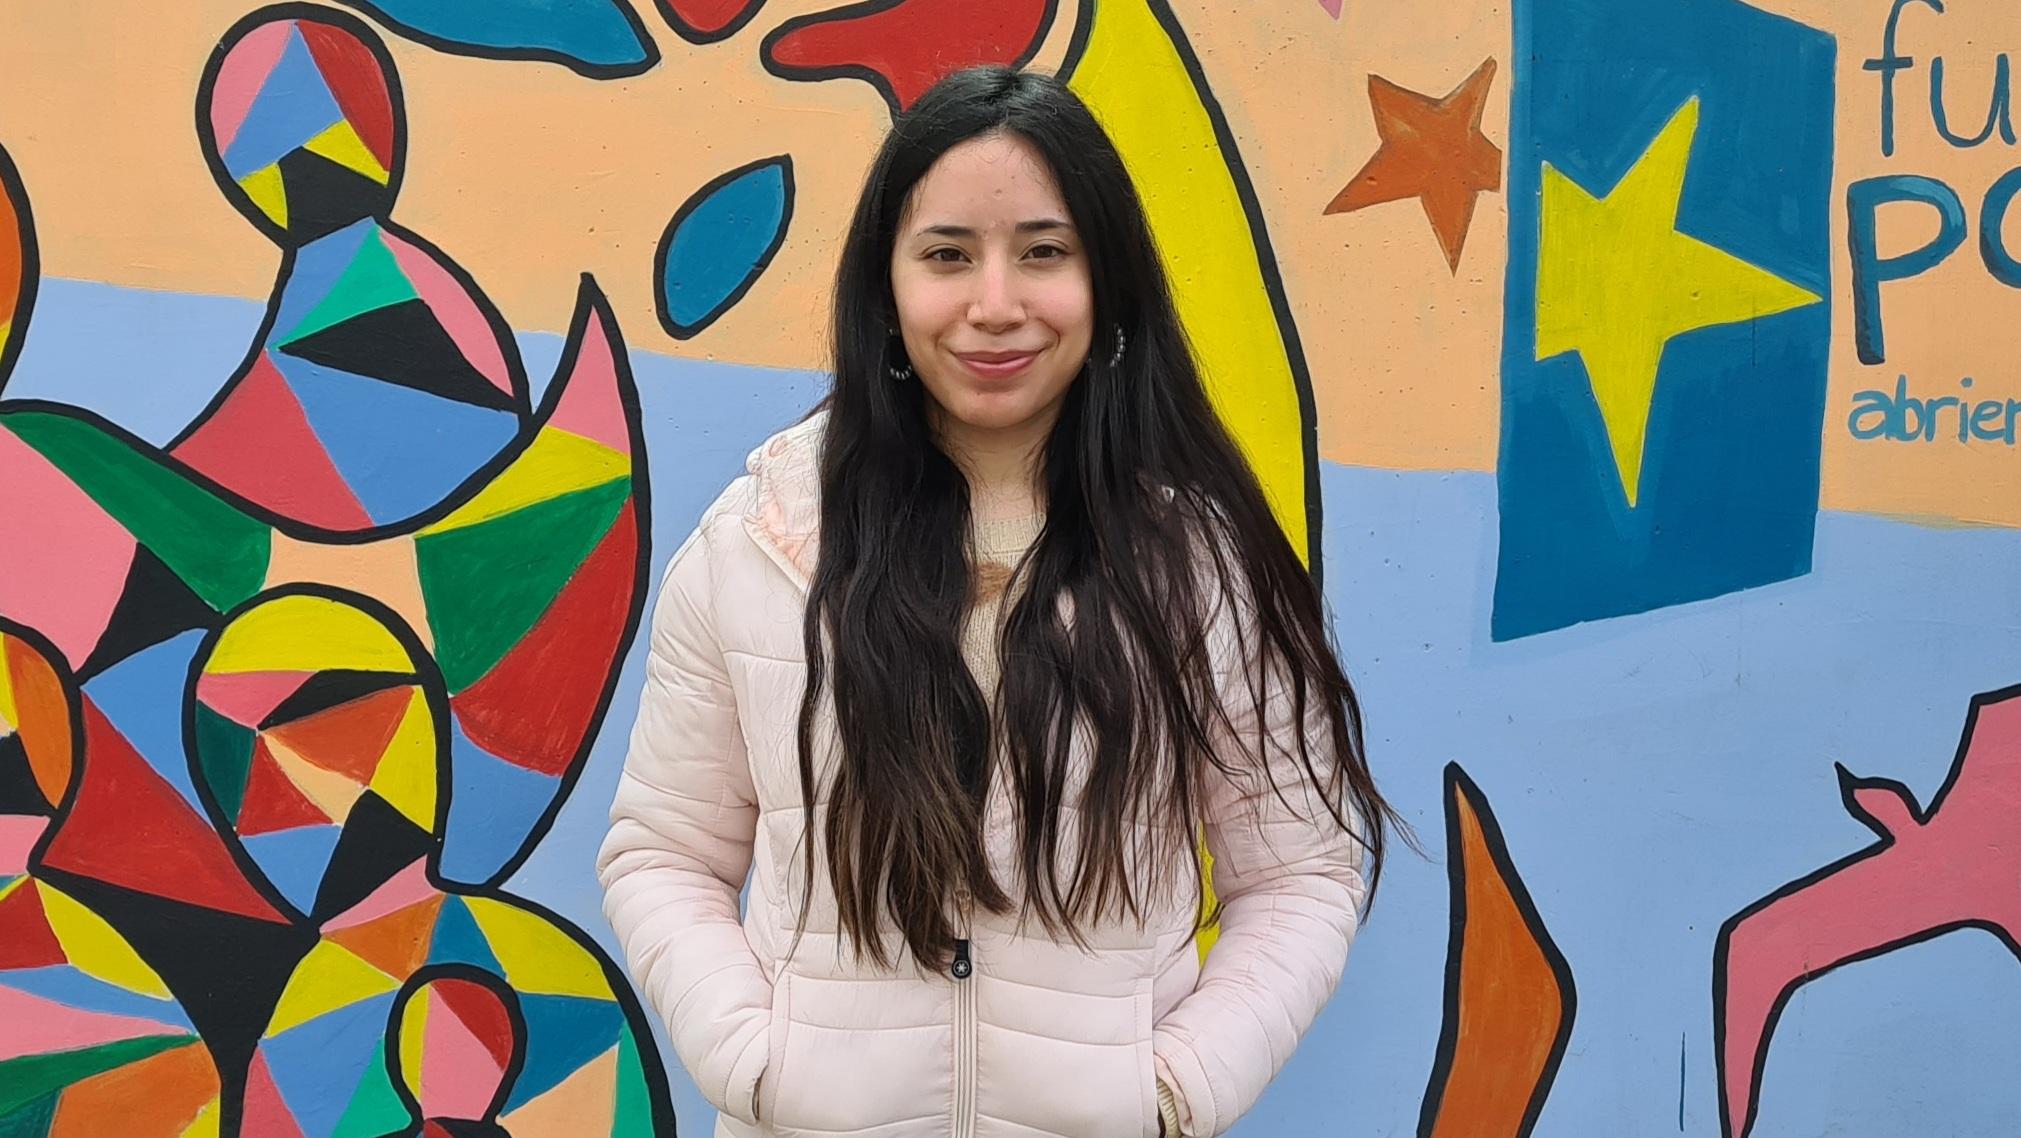 Valeria González Quinteros